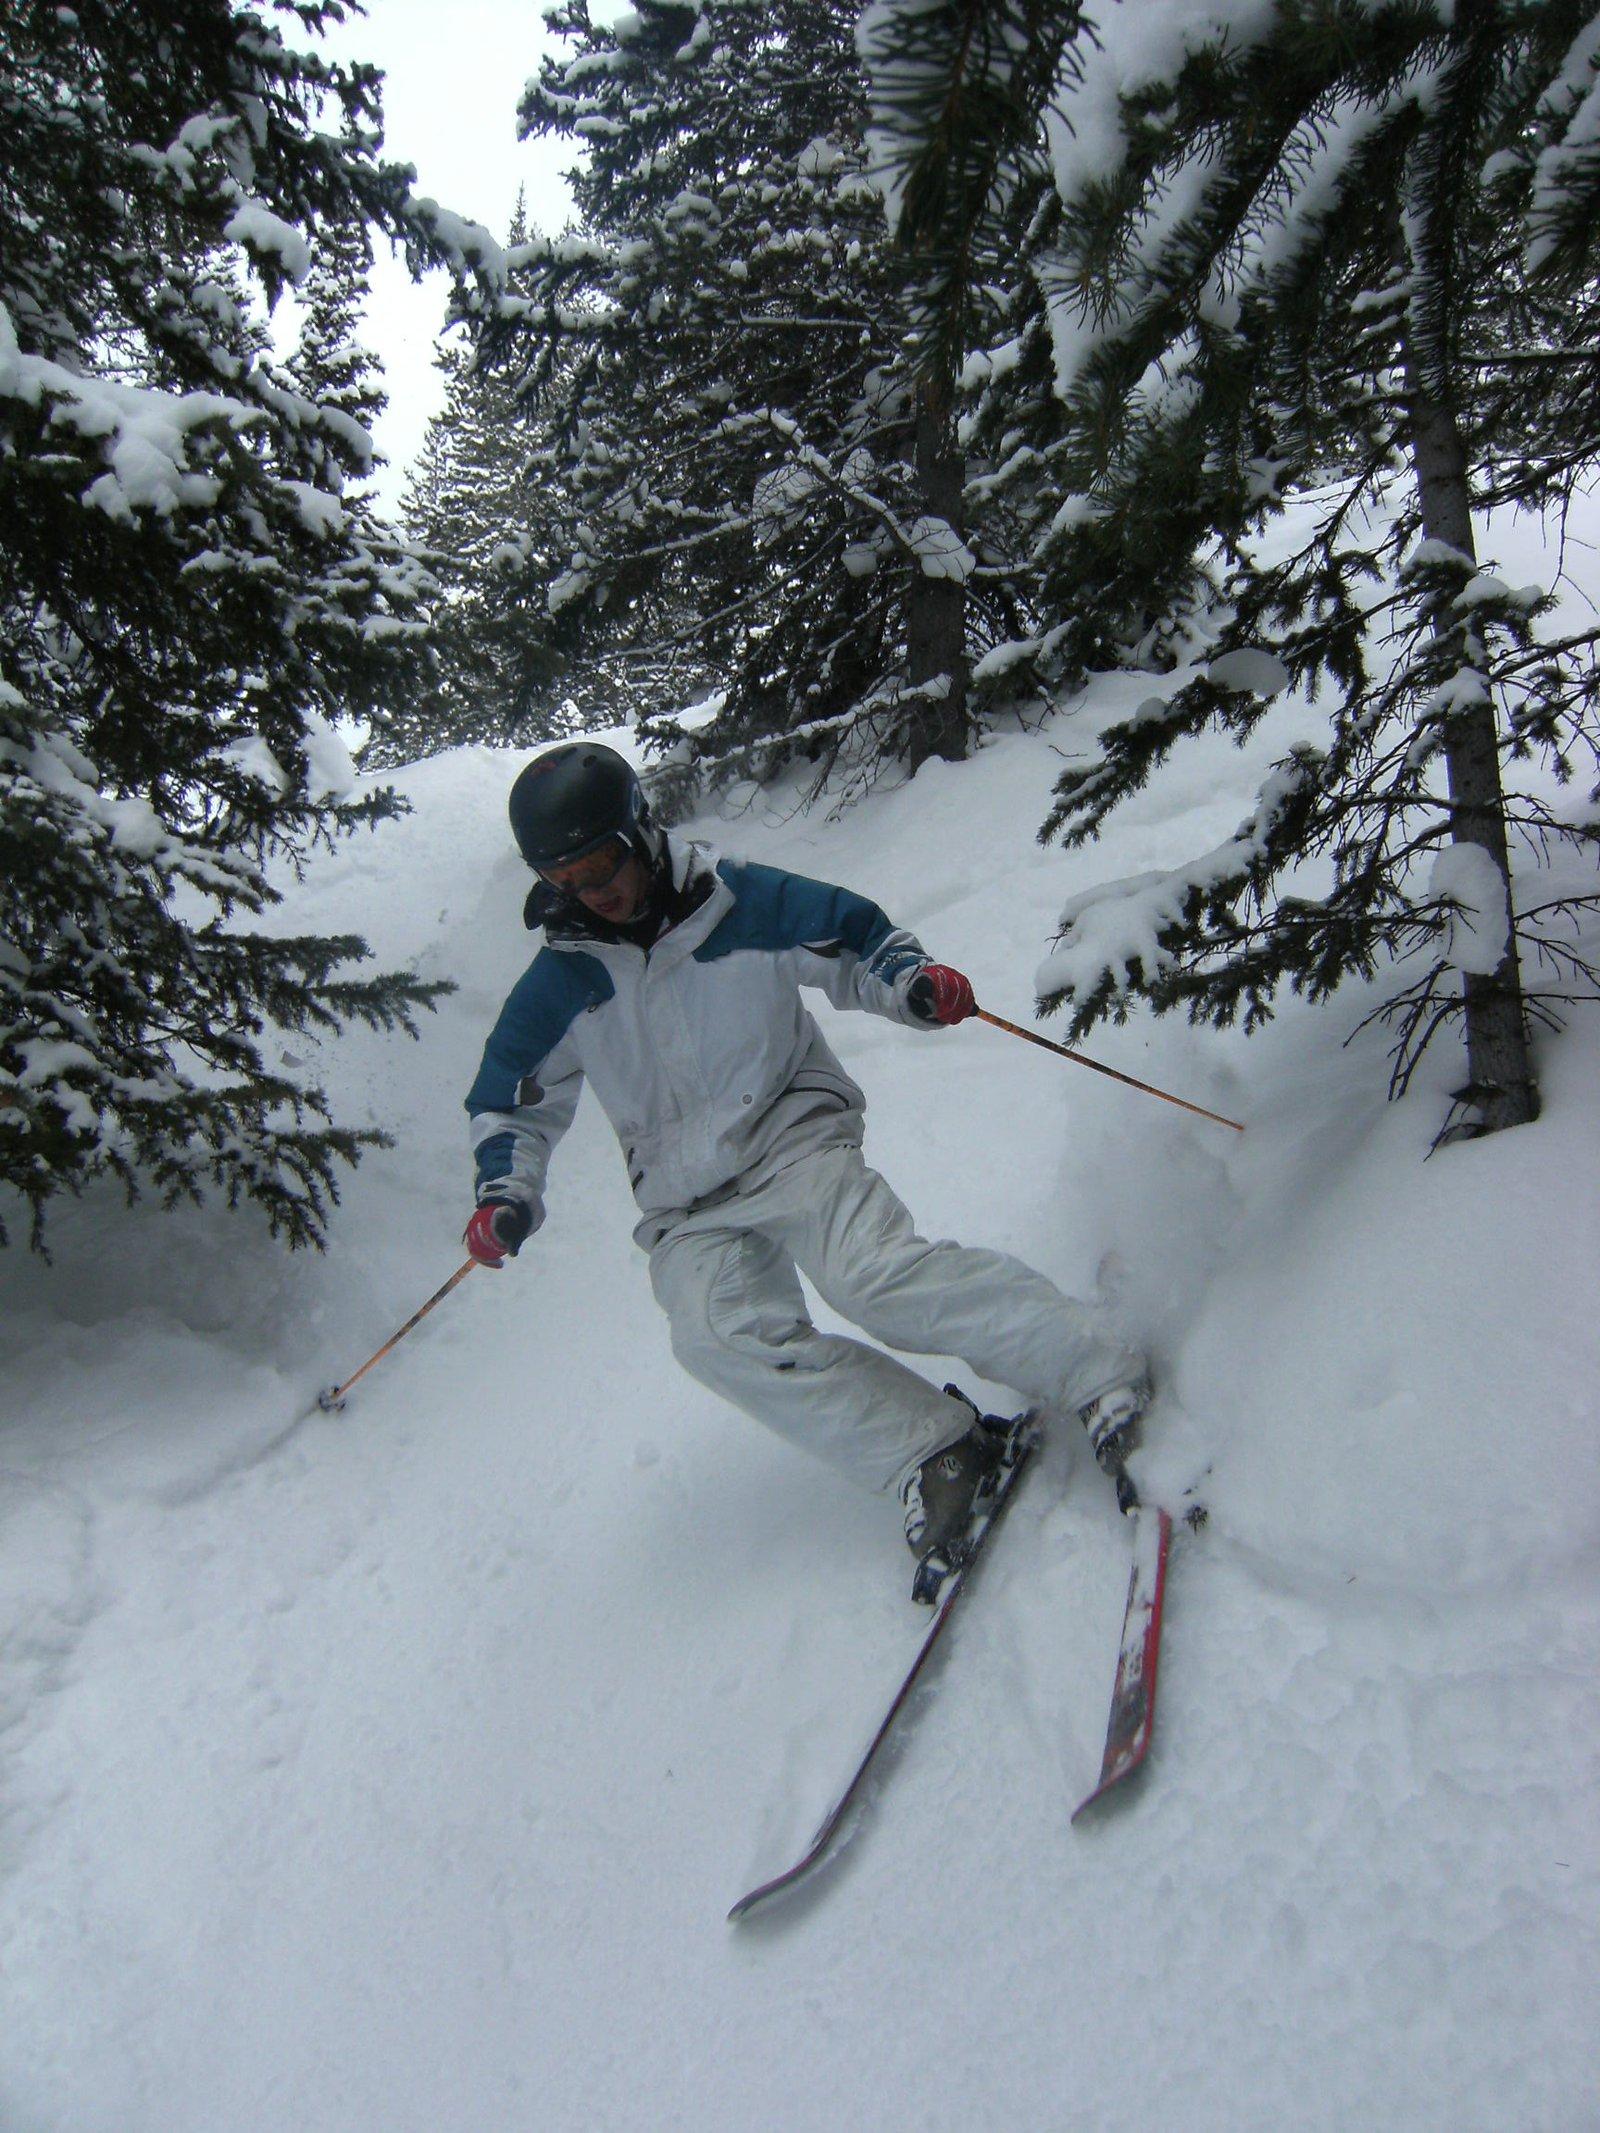 Tree skiing